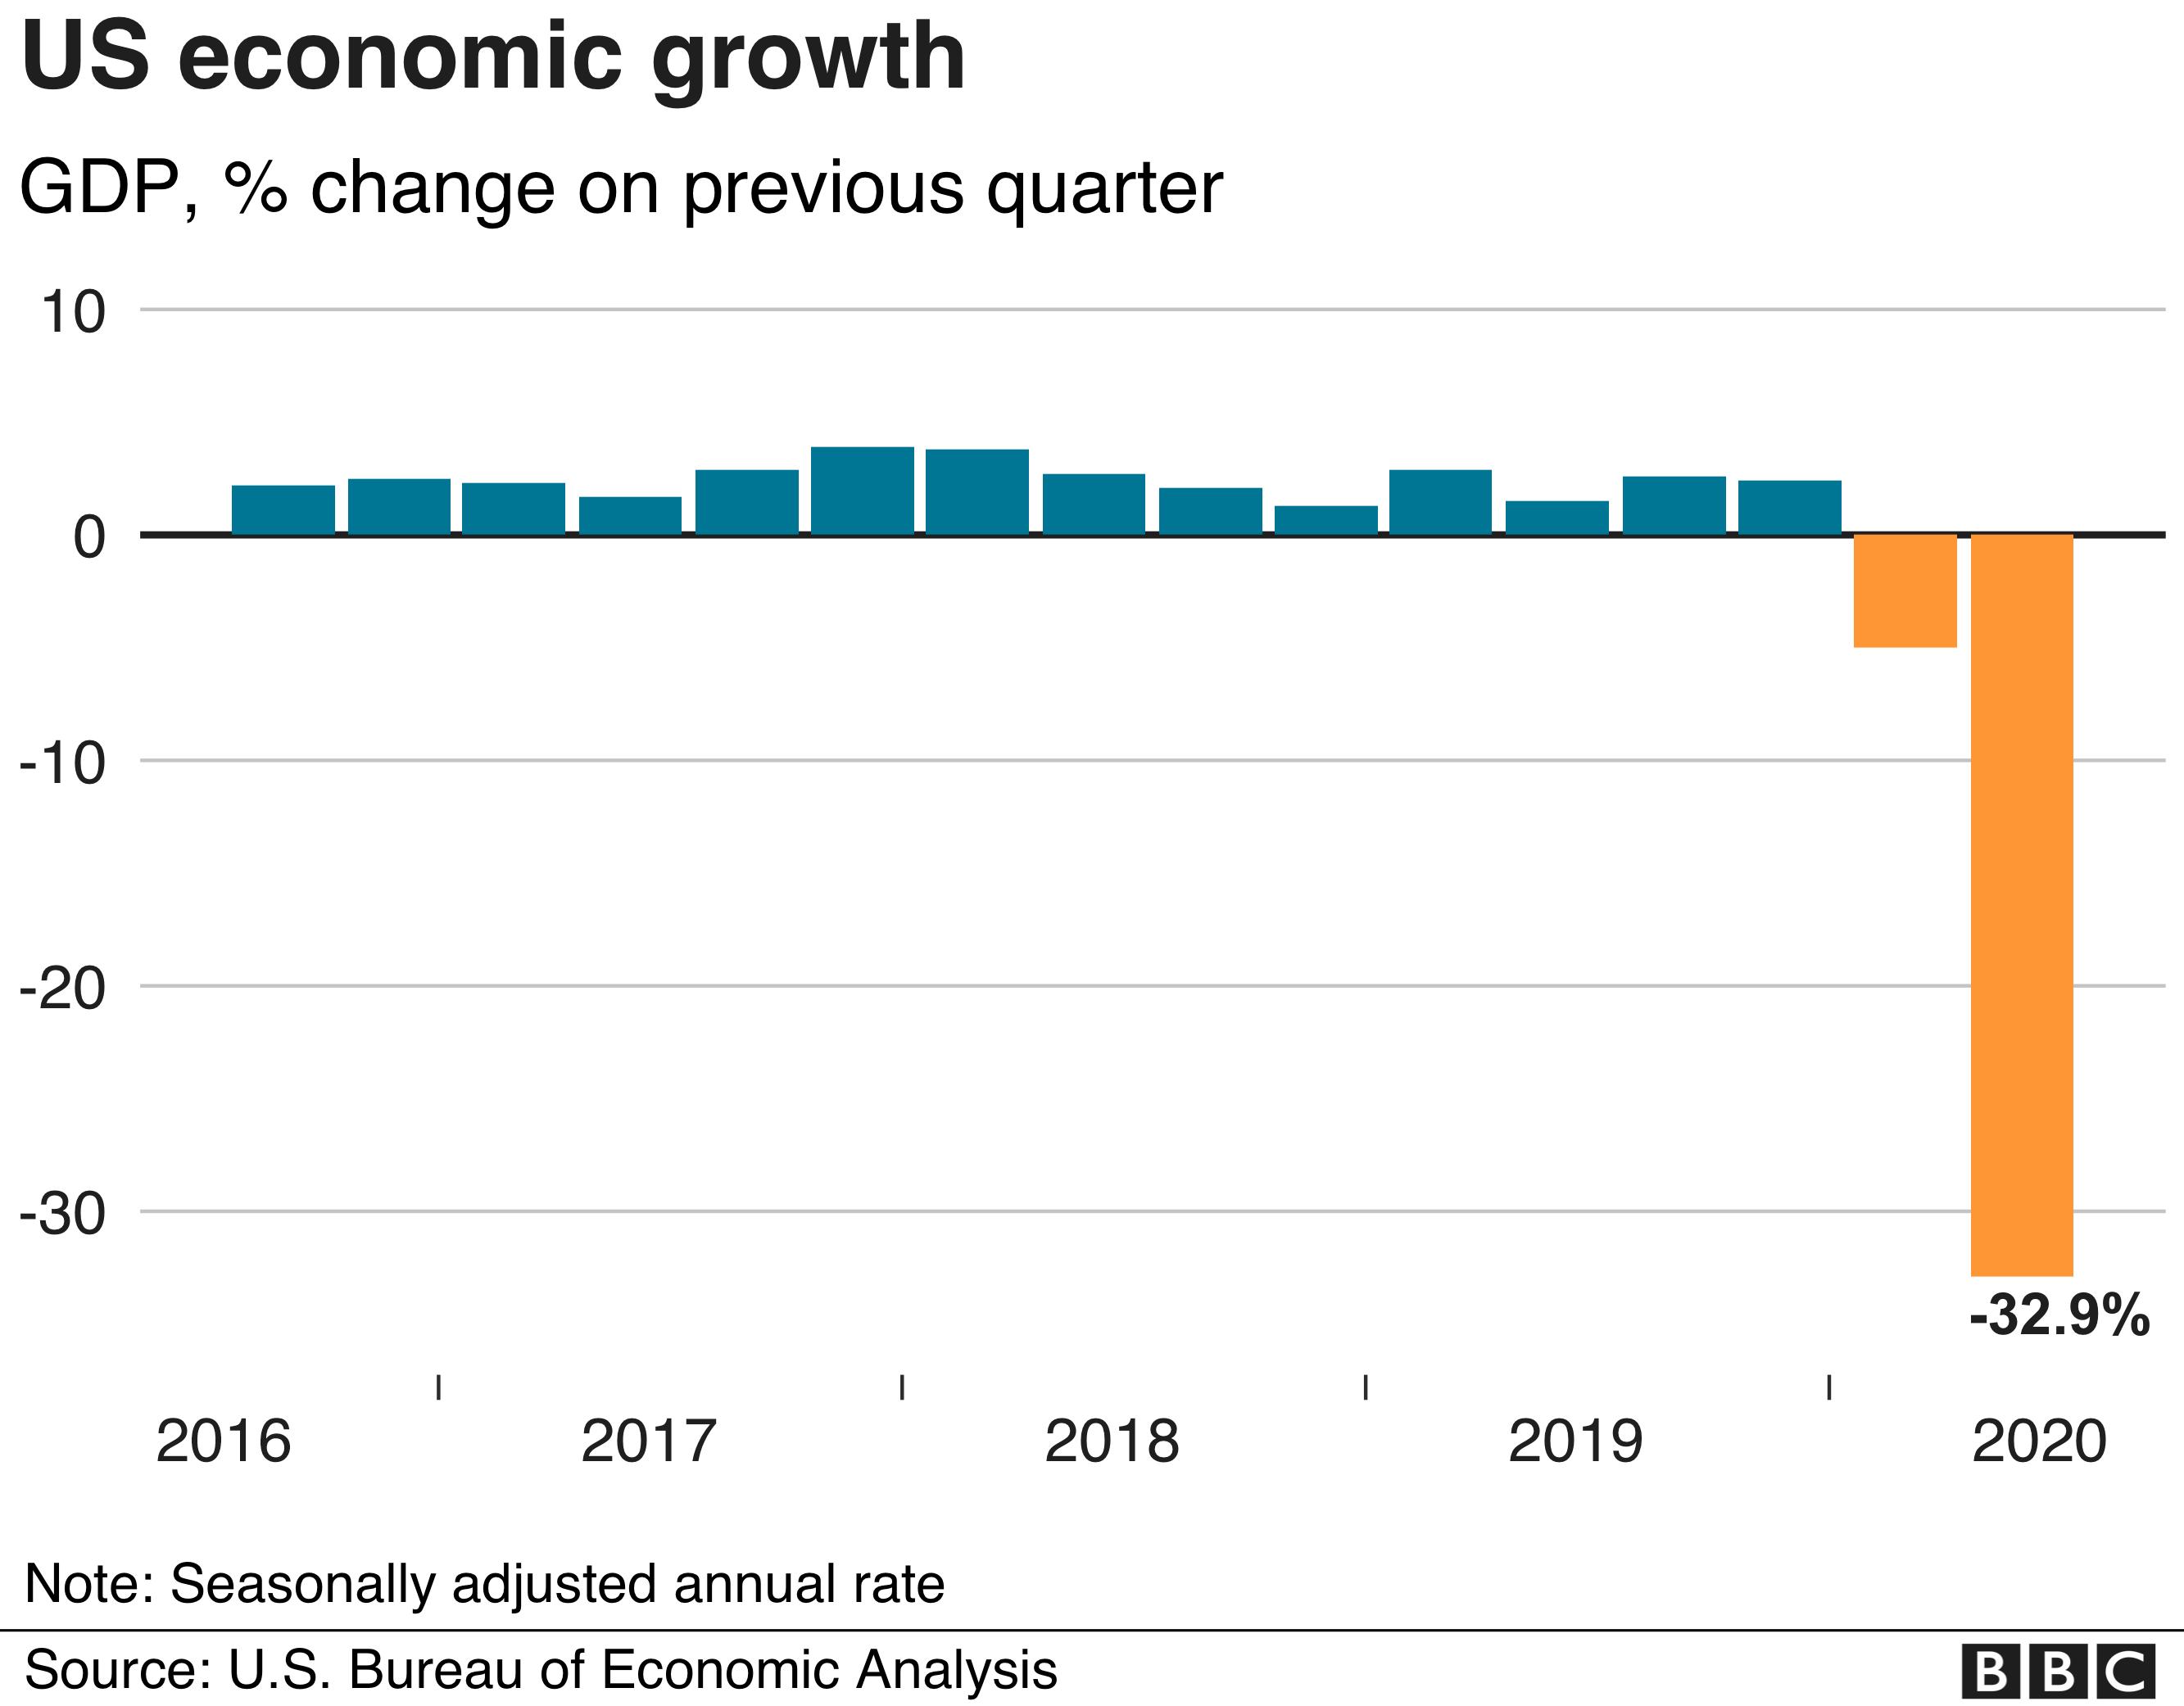 US economic growth graph